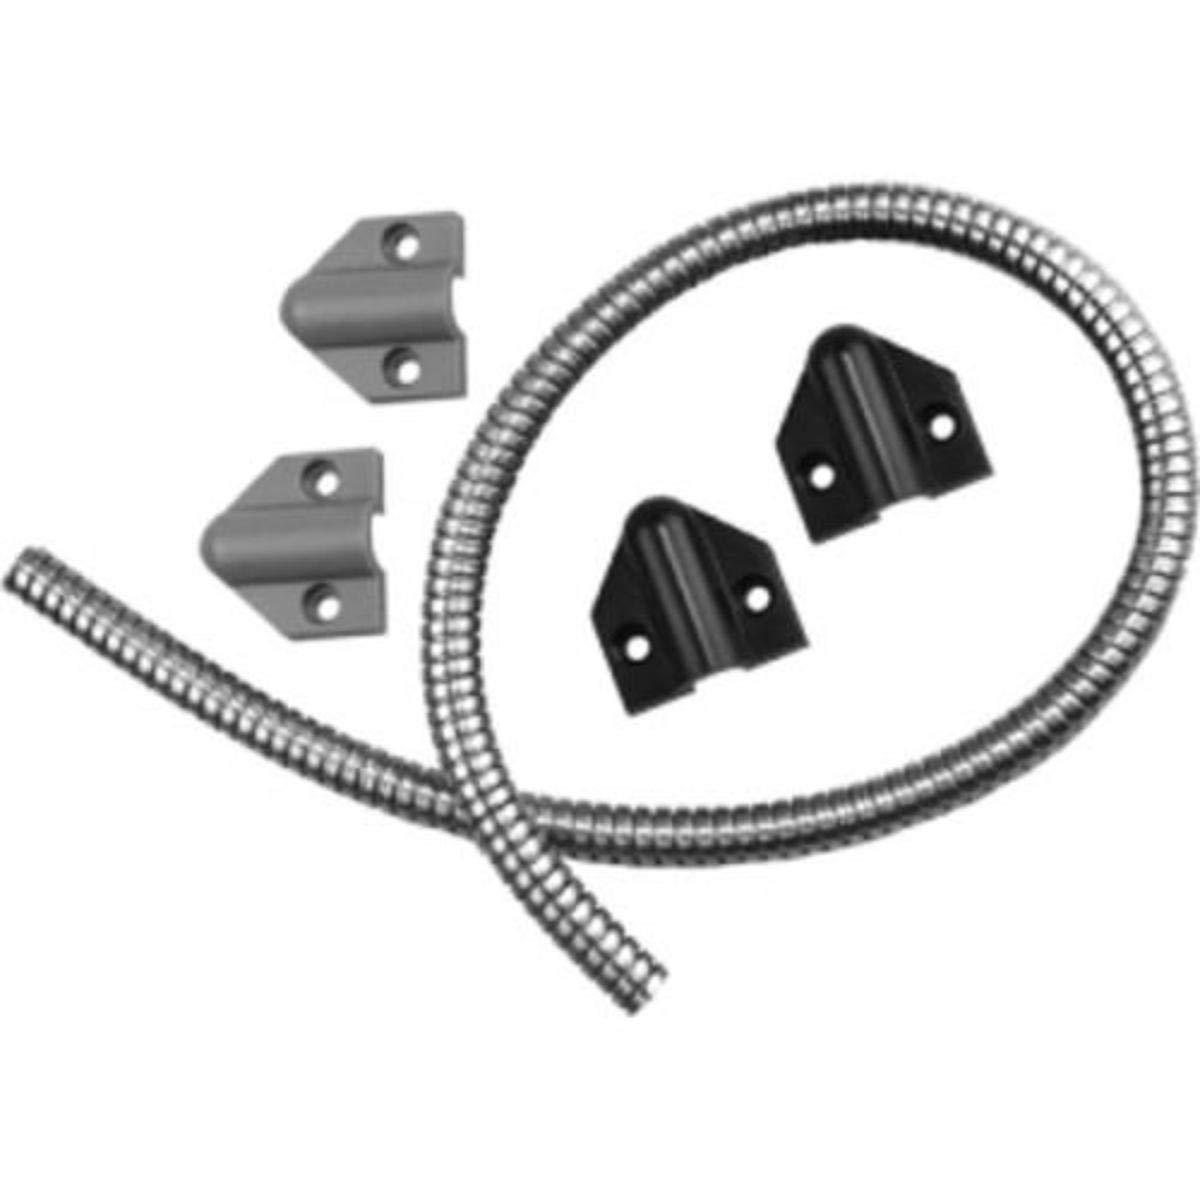 Securitron Stainless Steel Door Cord 18 in Tsb-c LT Gray or Black Caps for sale online